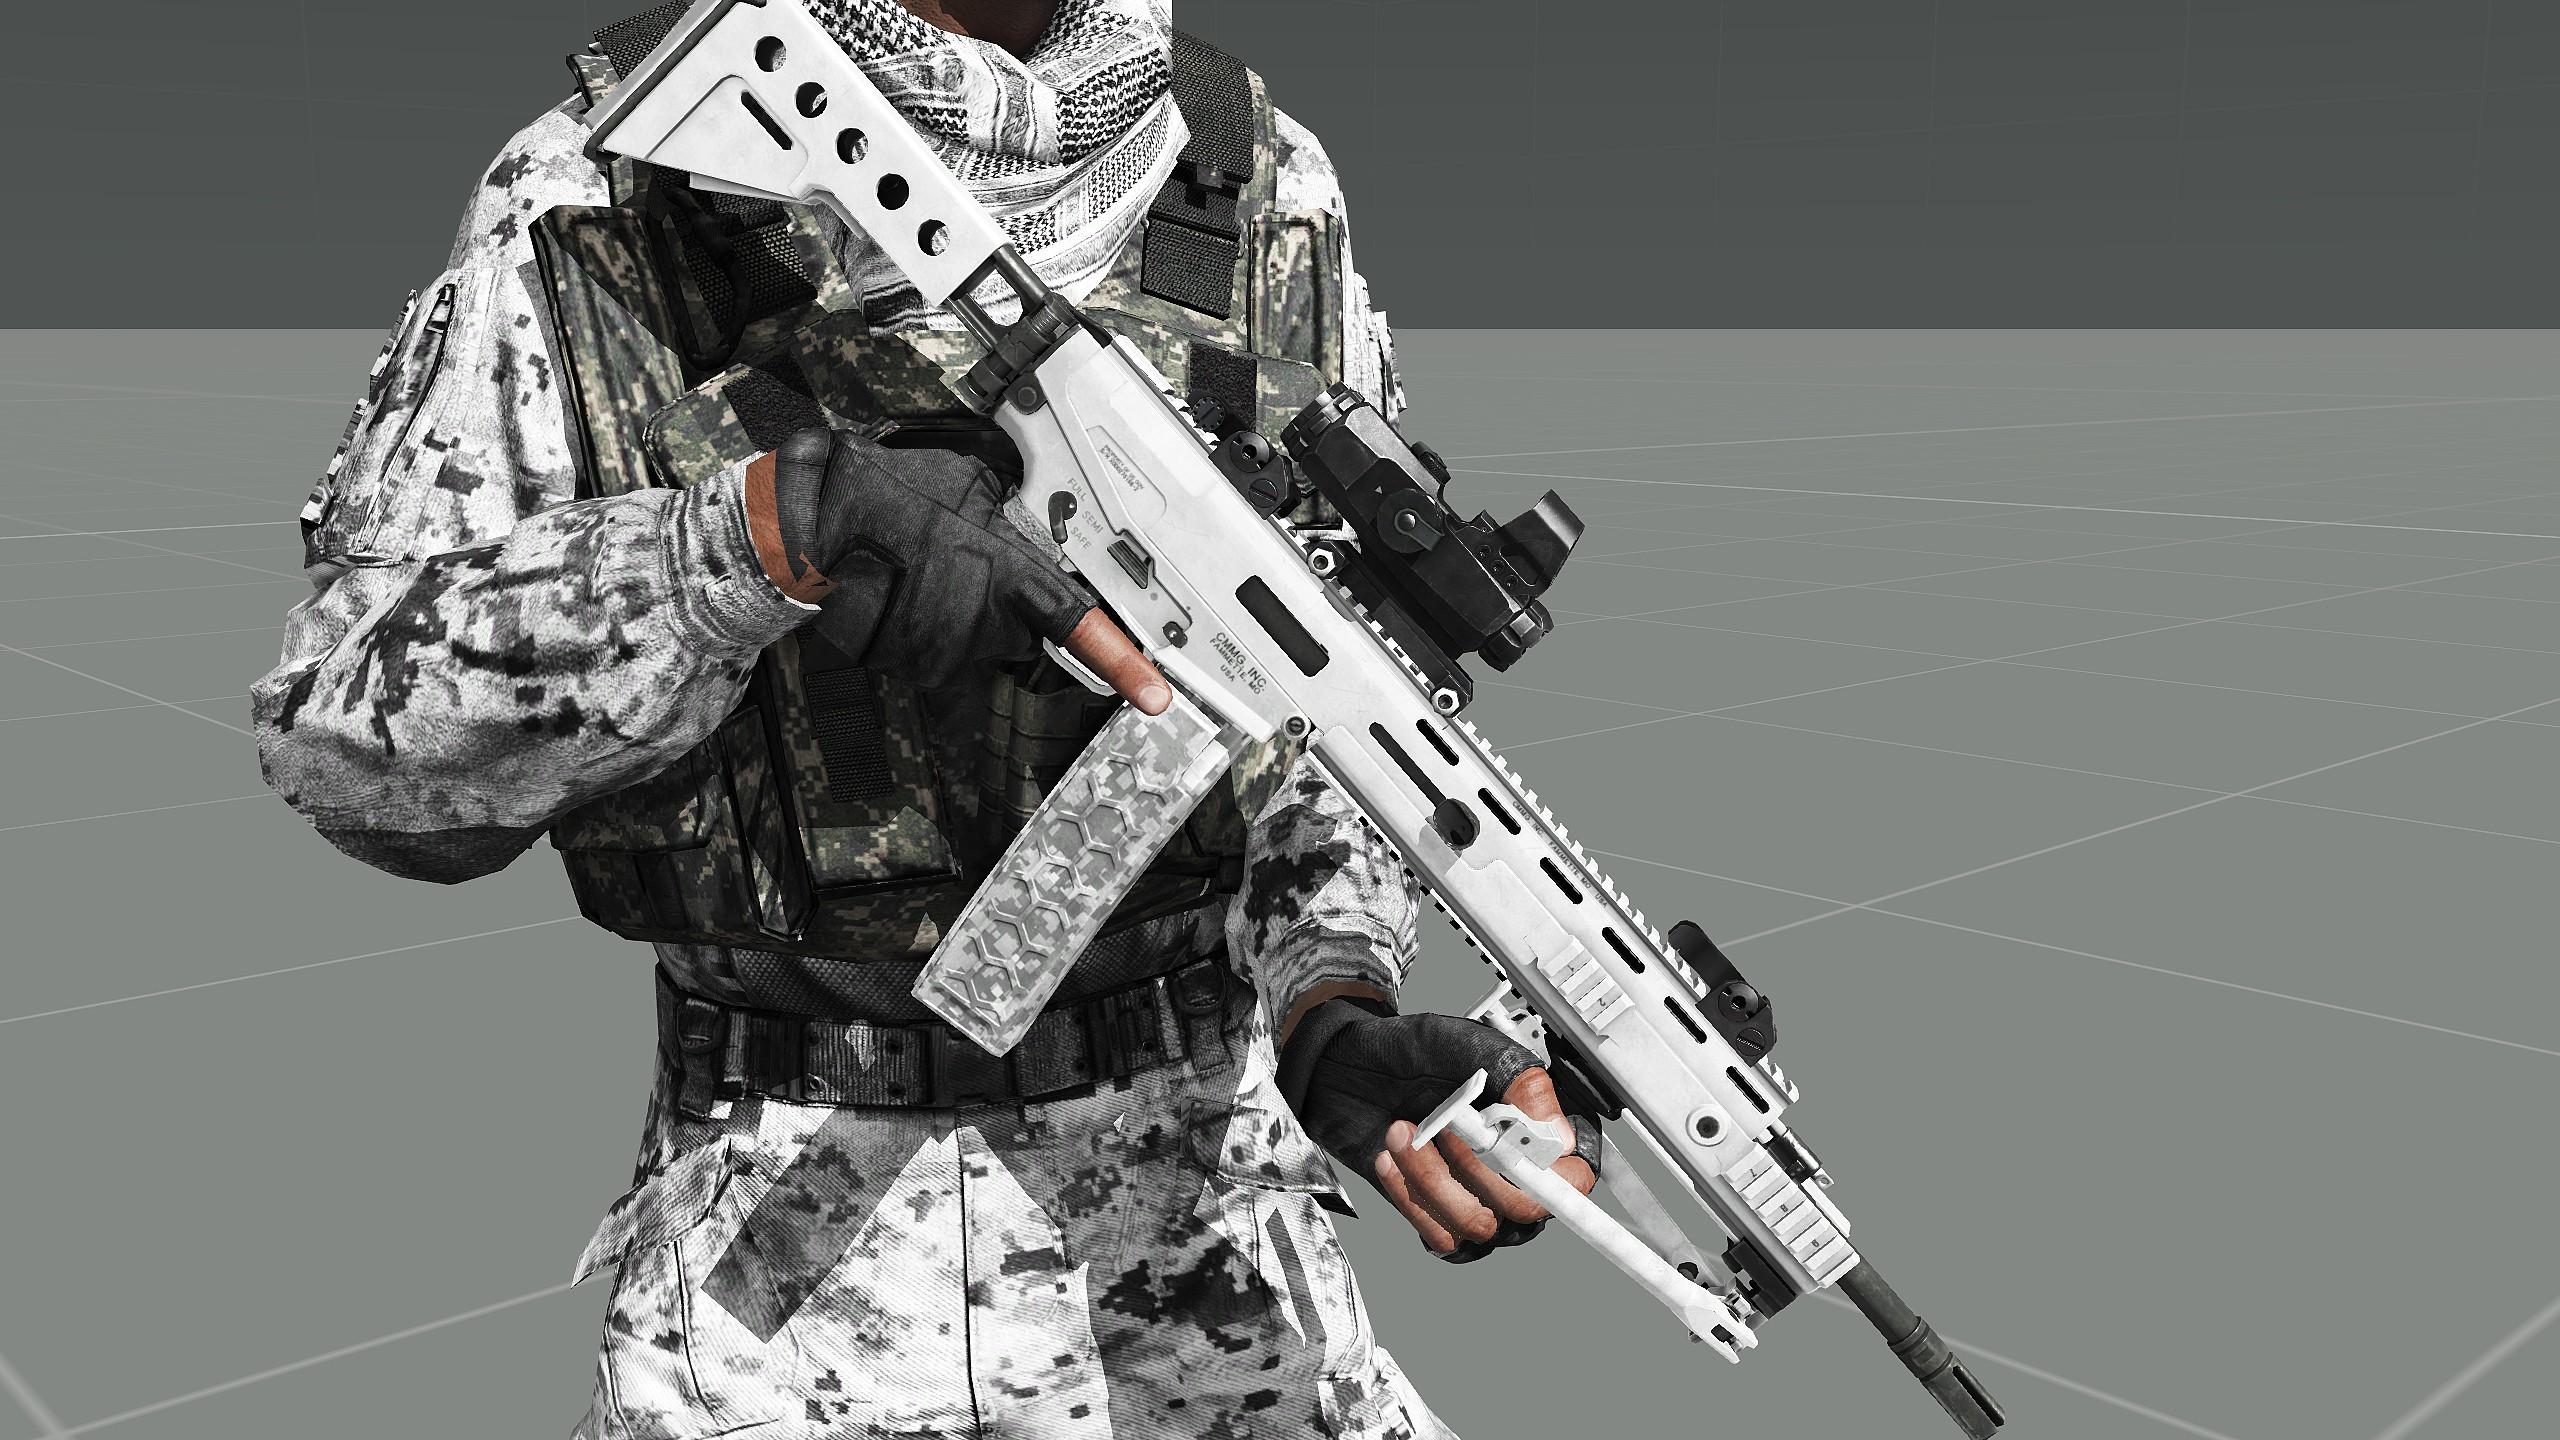 Sniper Rifle Wallpaper Hd Snow Camo Wallpaper 37 Pictures